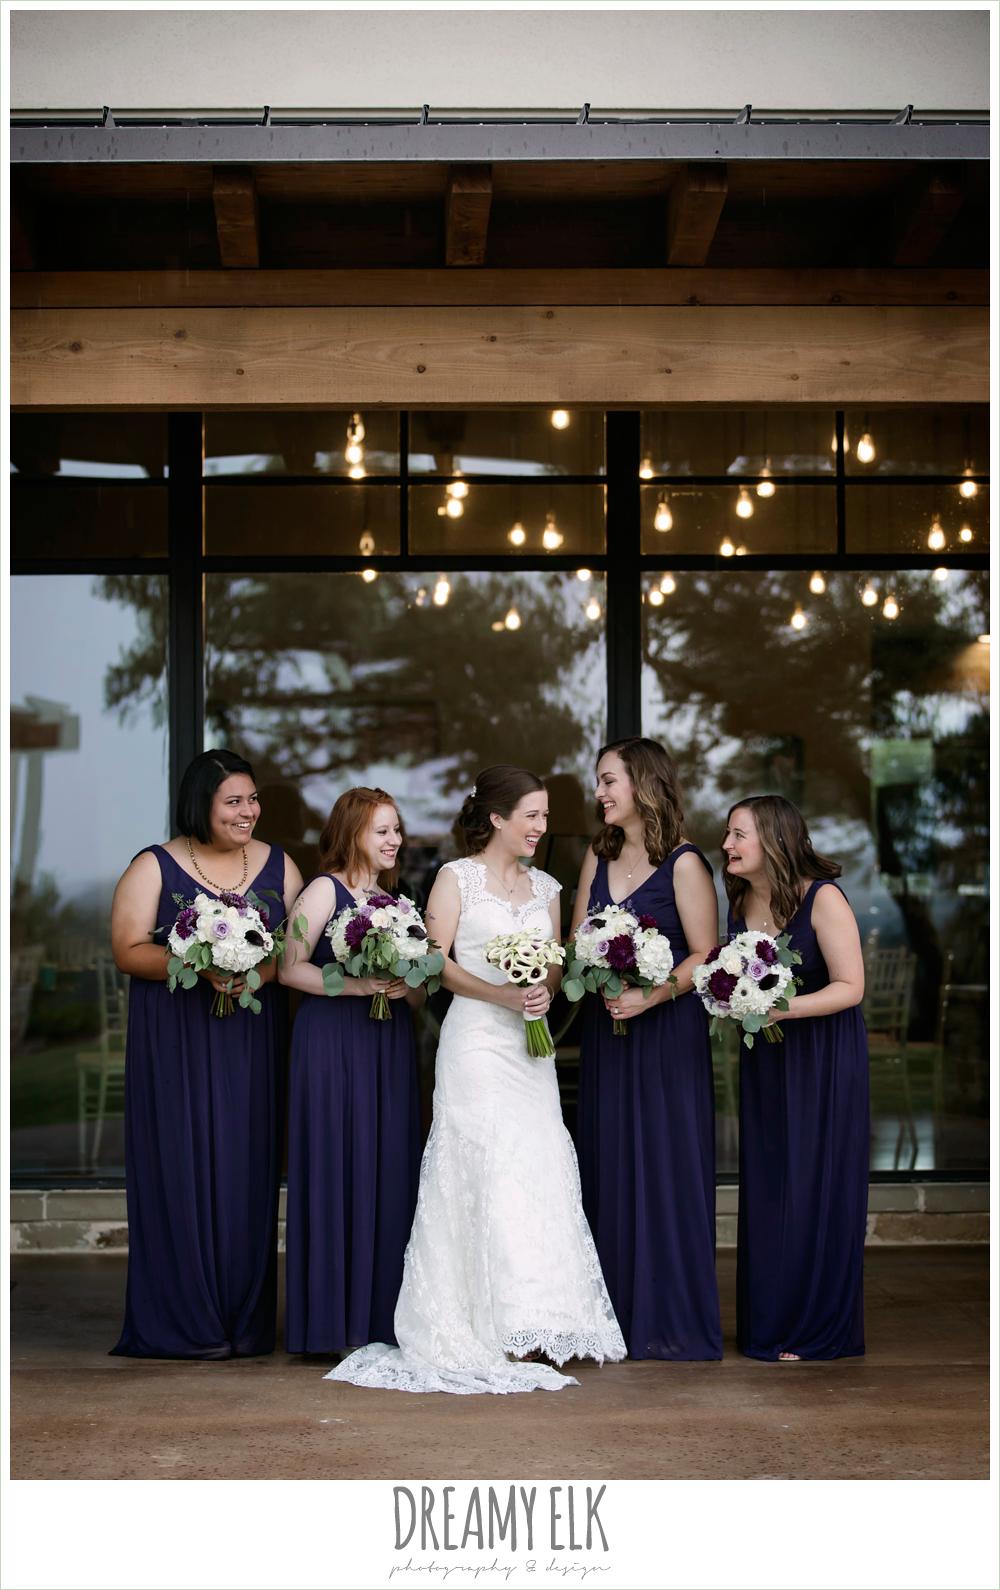 bride and bridesmaids, long dark purple bridesmaids dresses, purple and gold wedding, fall rainy wedding, canyonwood ridge, dripping springs, texas, photo {dreamy elk photography and design}